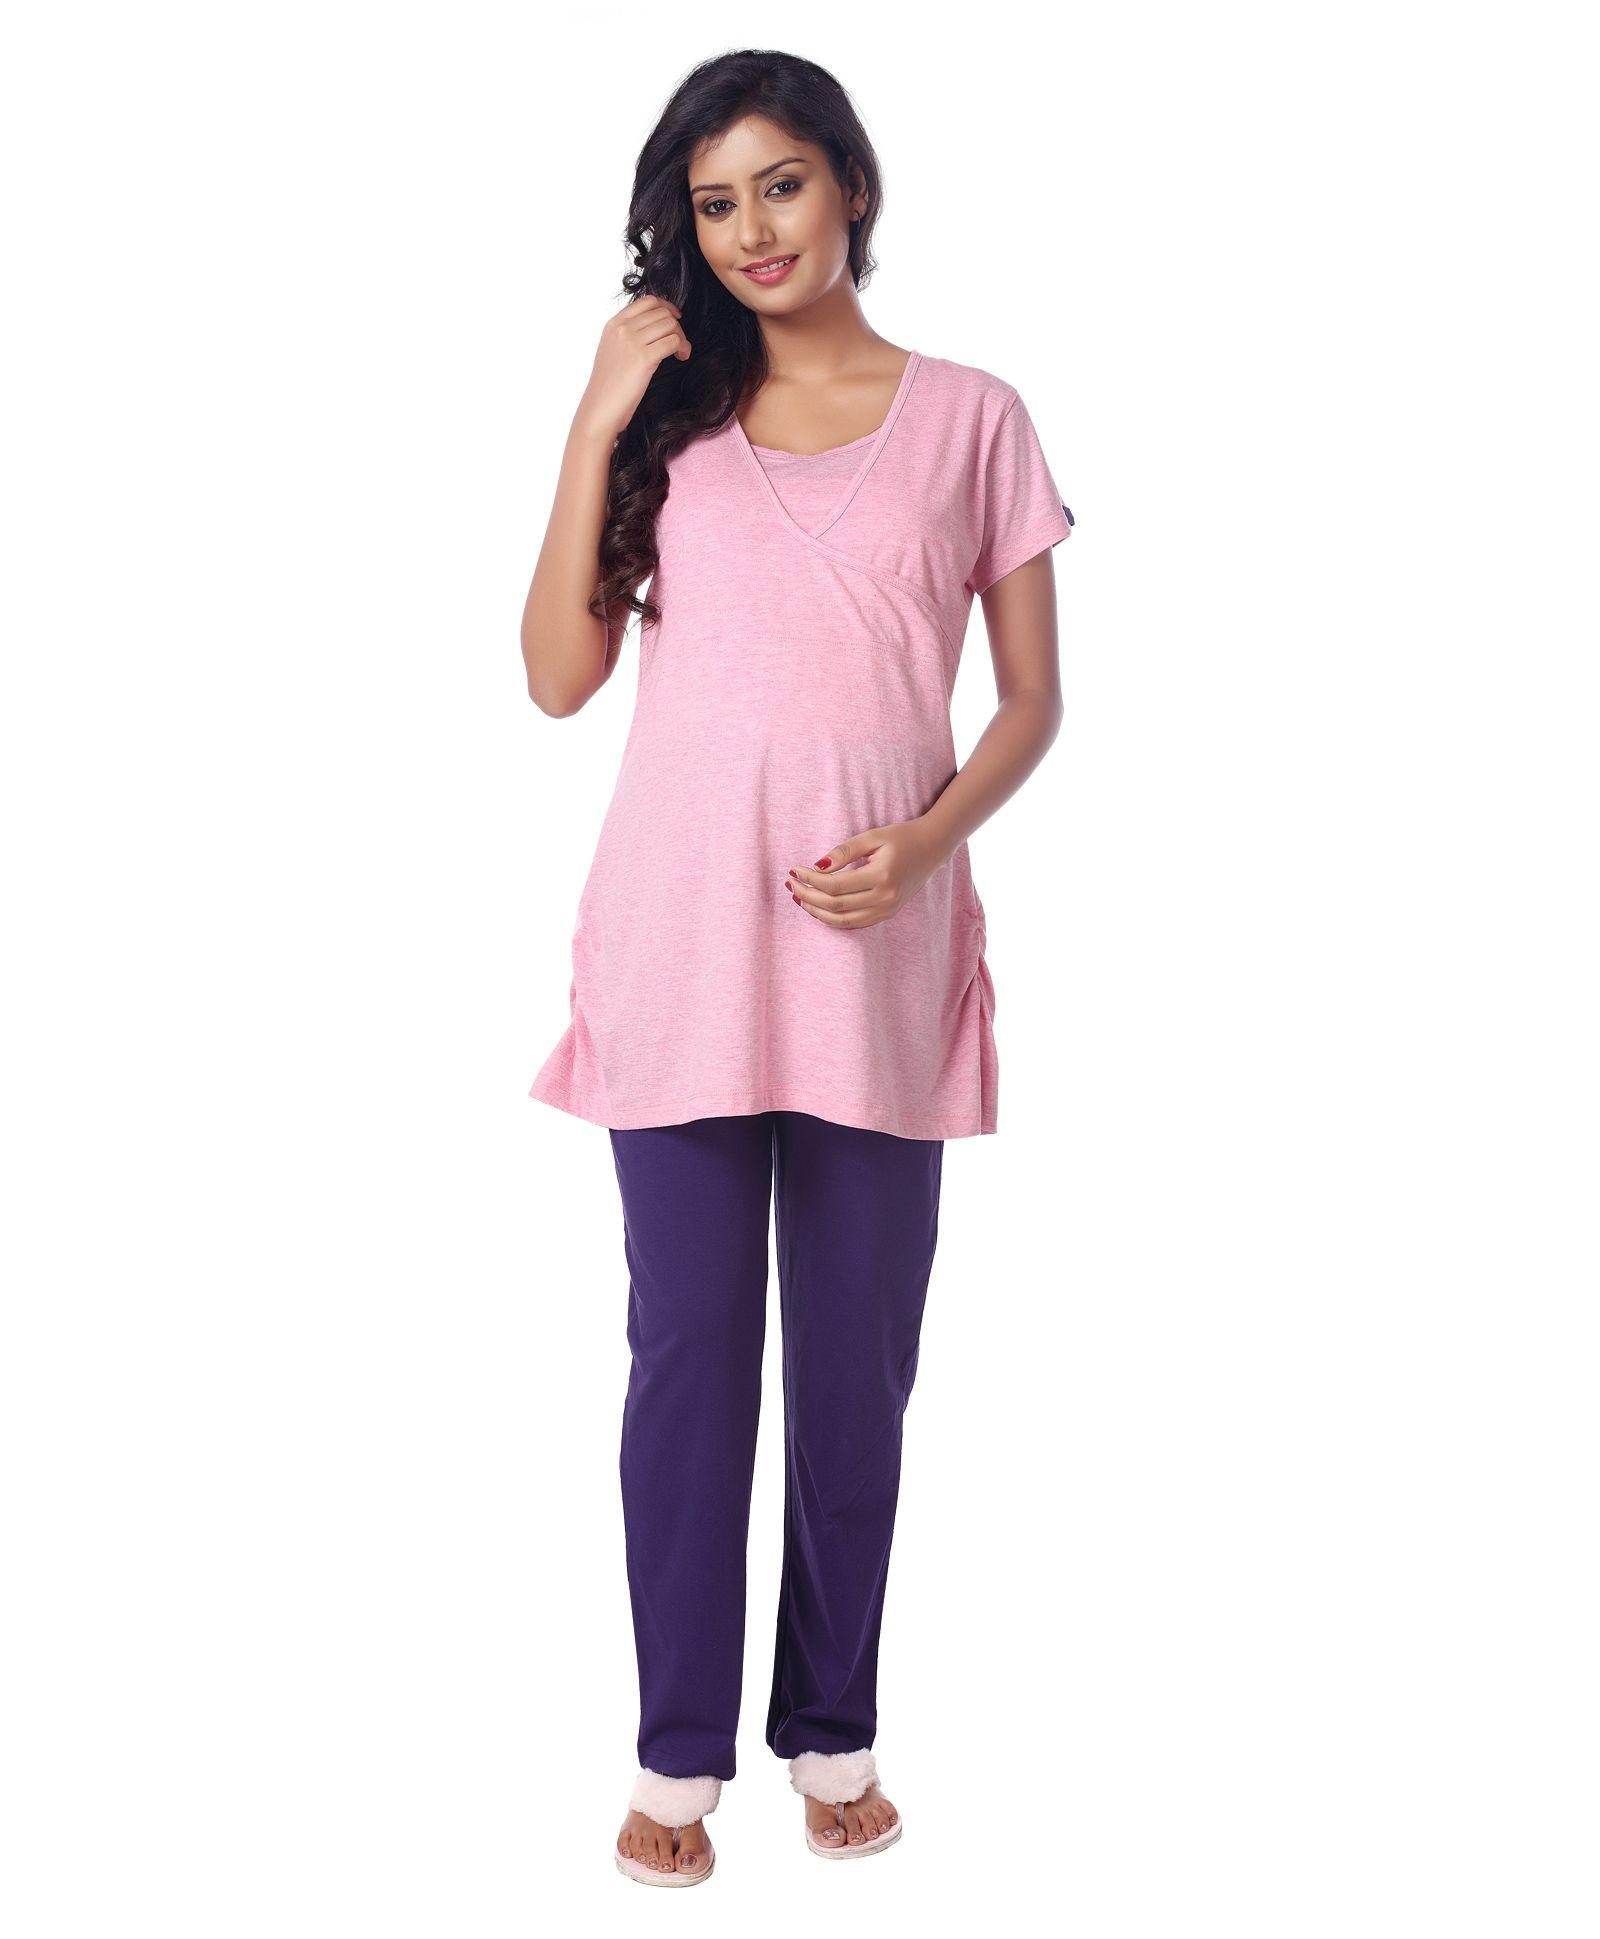 Kriti Half Sleeves Nursing Night Suit Set Pink Online in India 914e95801